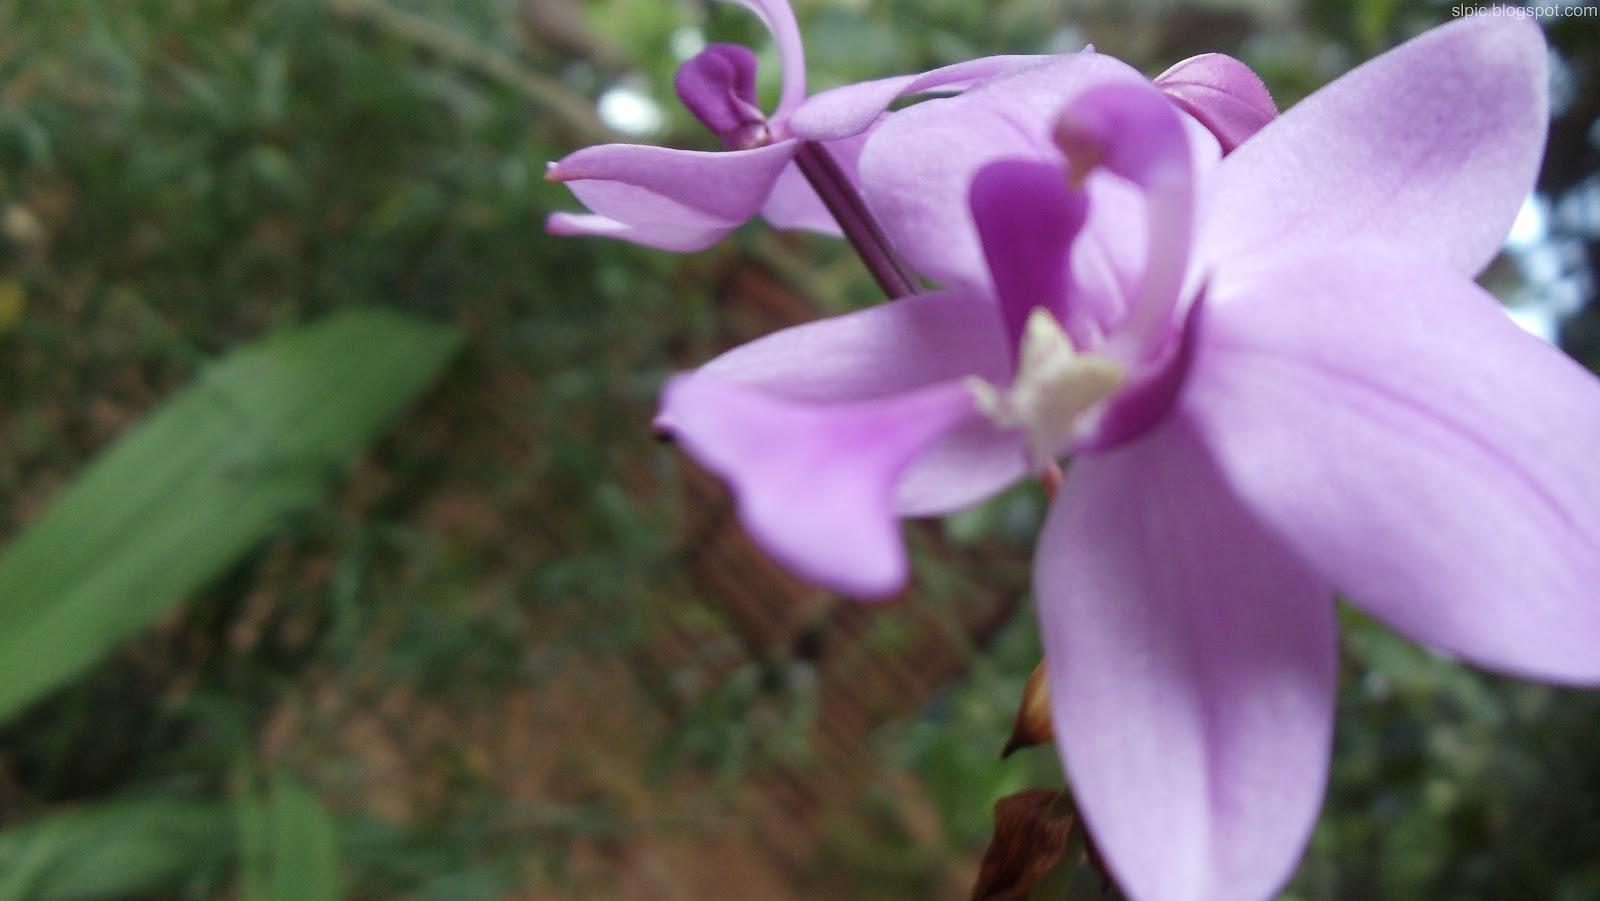 http://2.bp.blogspot.com/-j6QP441PUUk/UBImXOzT-9I/AAAAAAAAKj4/EjL8zVJ6v04/s1600/Srilanka+Various+Flowers+And+Nature++(10).JPG